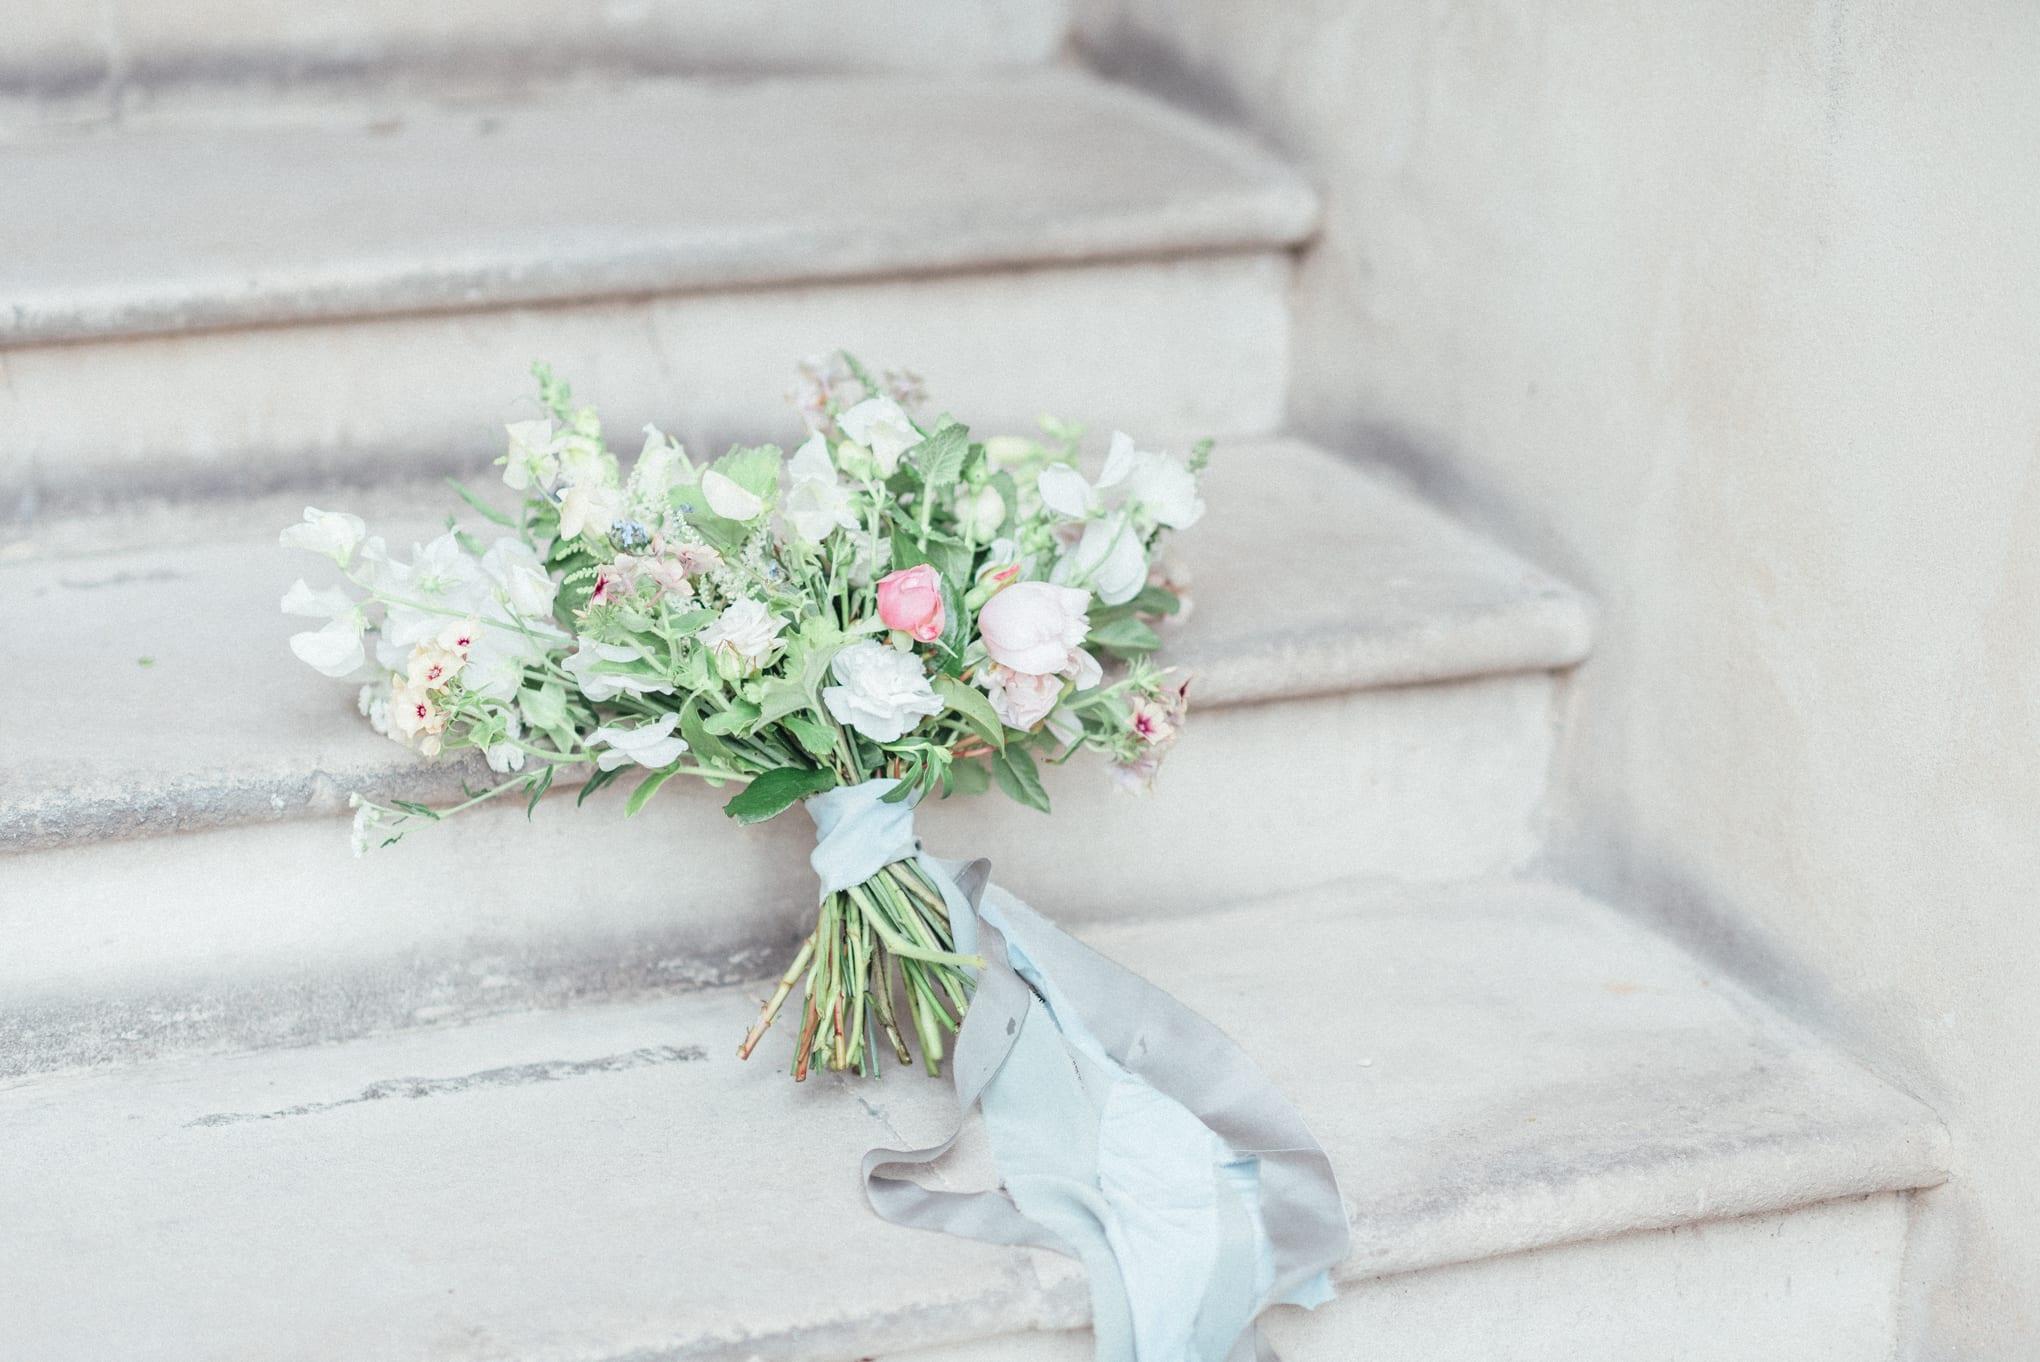 Pastel wedding flowers hand tied